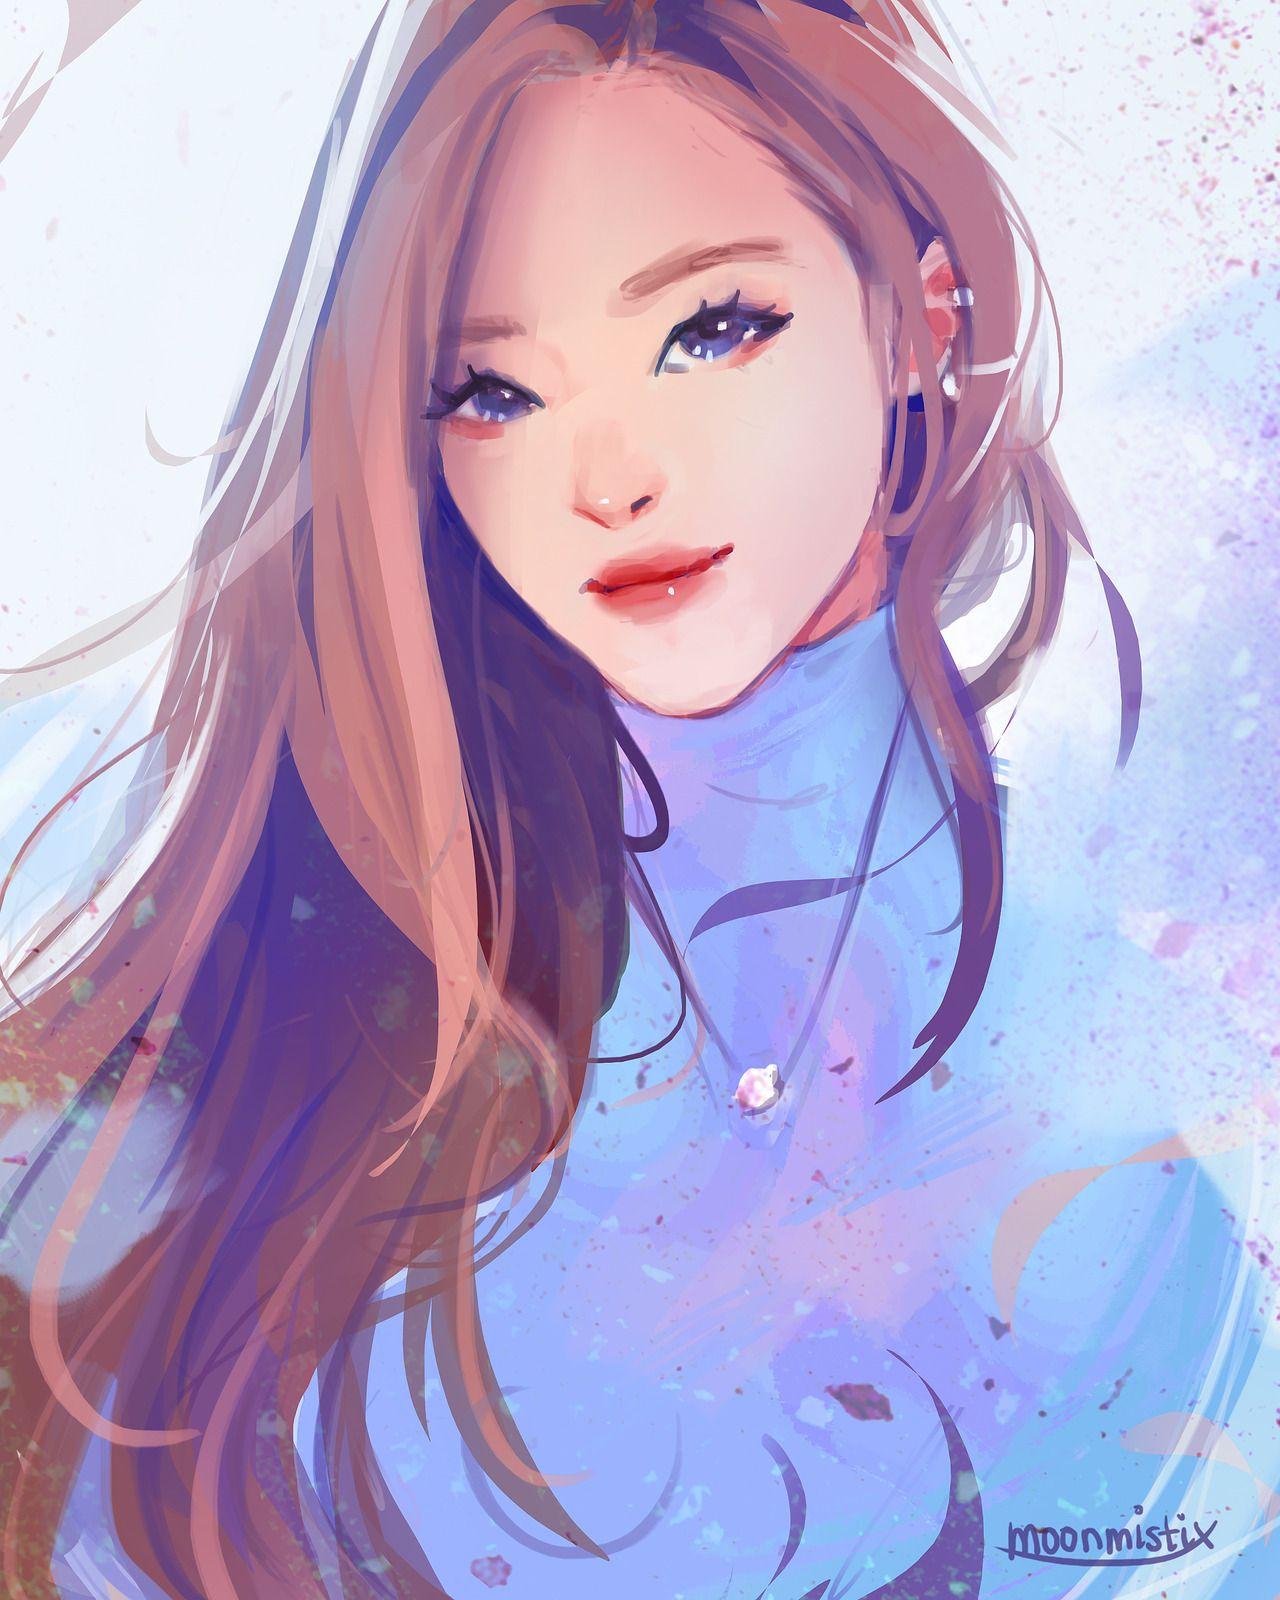 Save Me Http Moonmistix Tumblr Com Anime Art Girl Cute Drawings Digital Art Girl